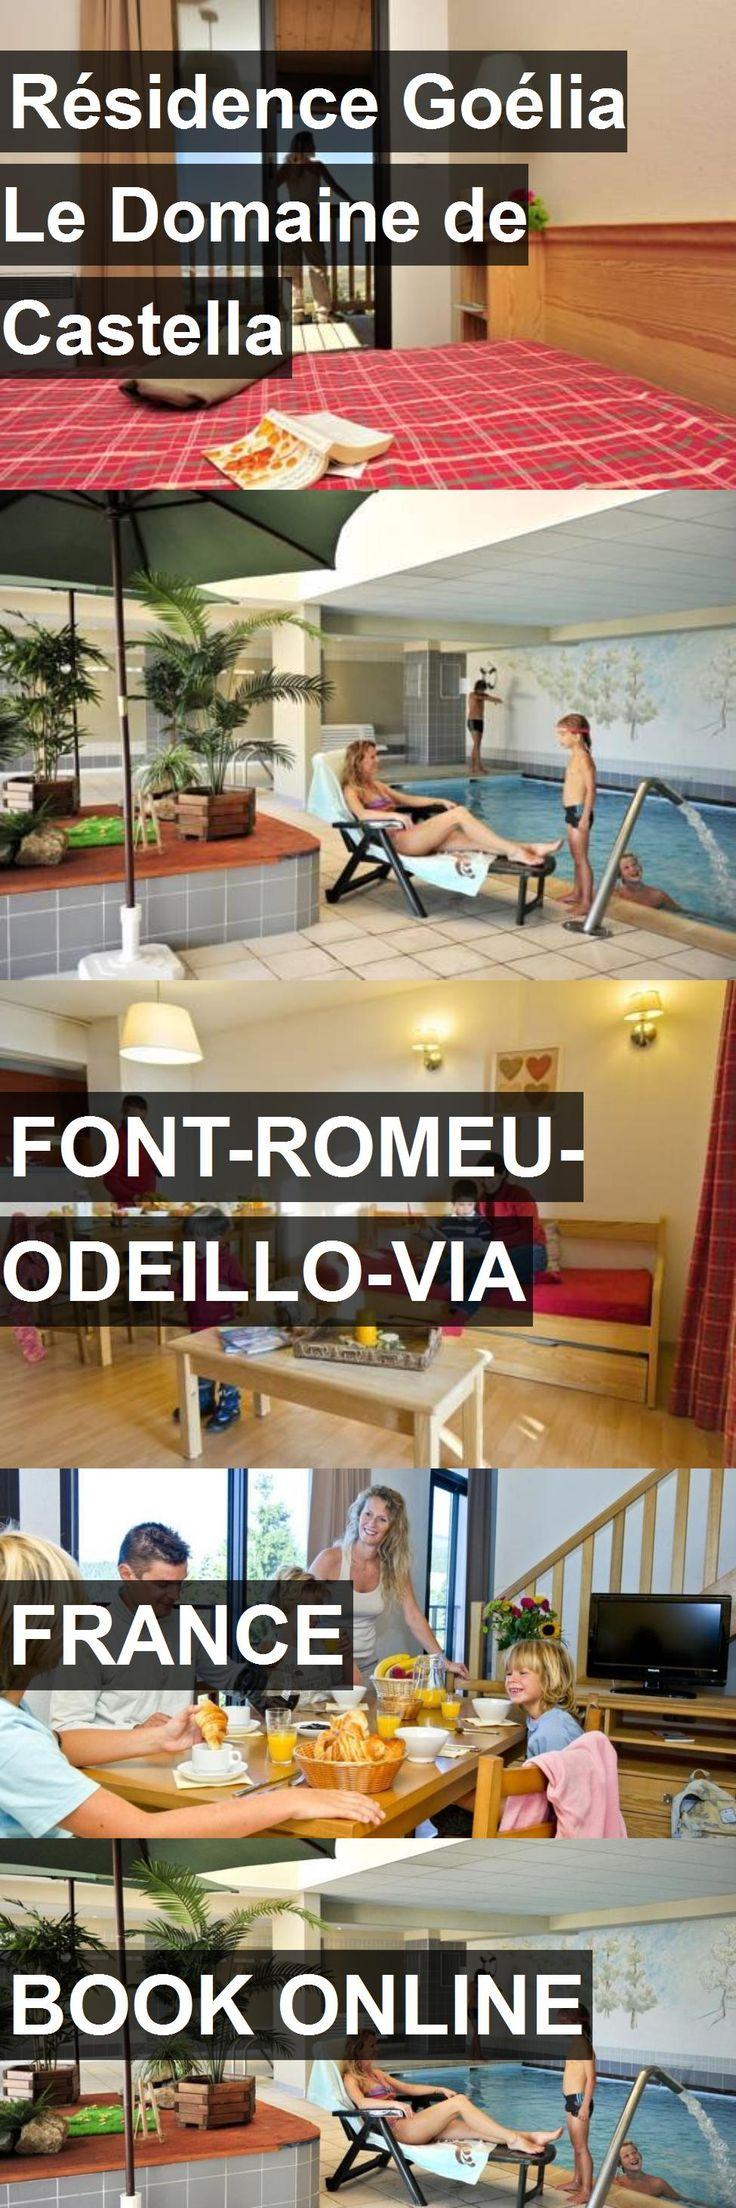 Hotel Résidence Goélia Le Domaine de Castella in Font-Romeu-Odeillo-Via, France. For more information, photos, reviews and best prices please follow the link. #France #Font-Romeu-Odeillo-Via #travel #vacation #hotel